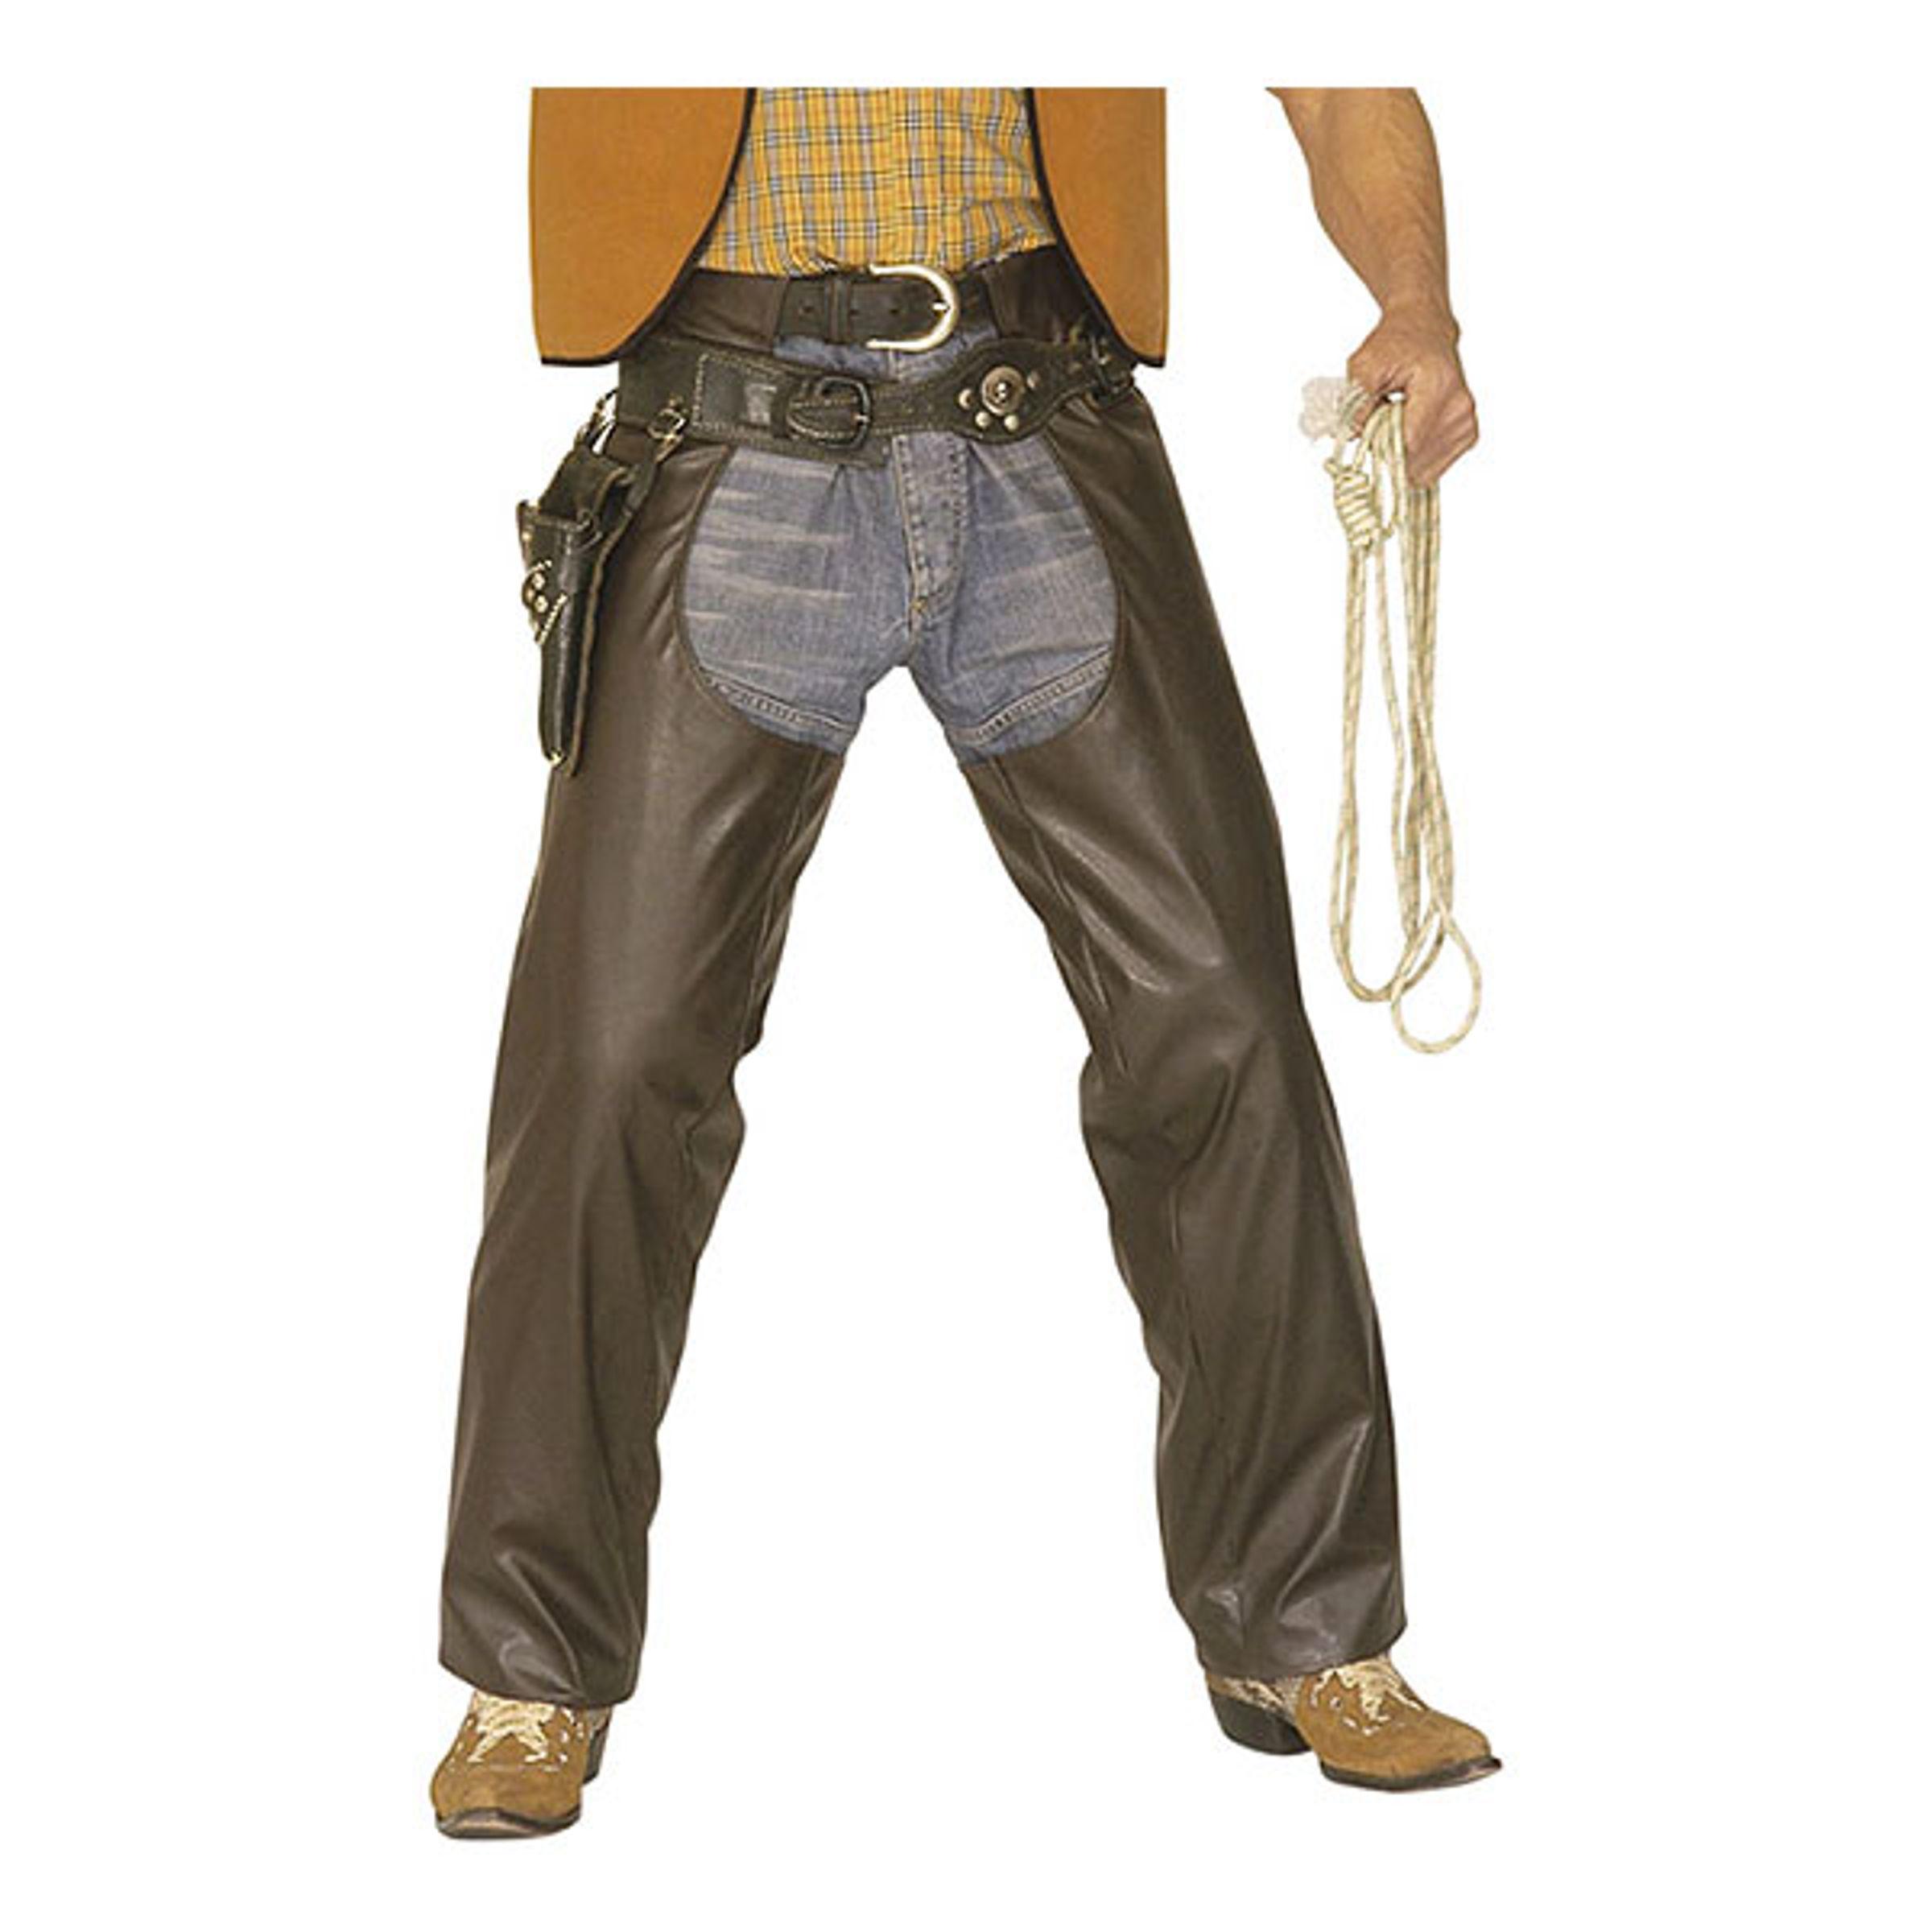 Cowboy Chaps Bruna i Läderlook - Medium/Large